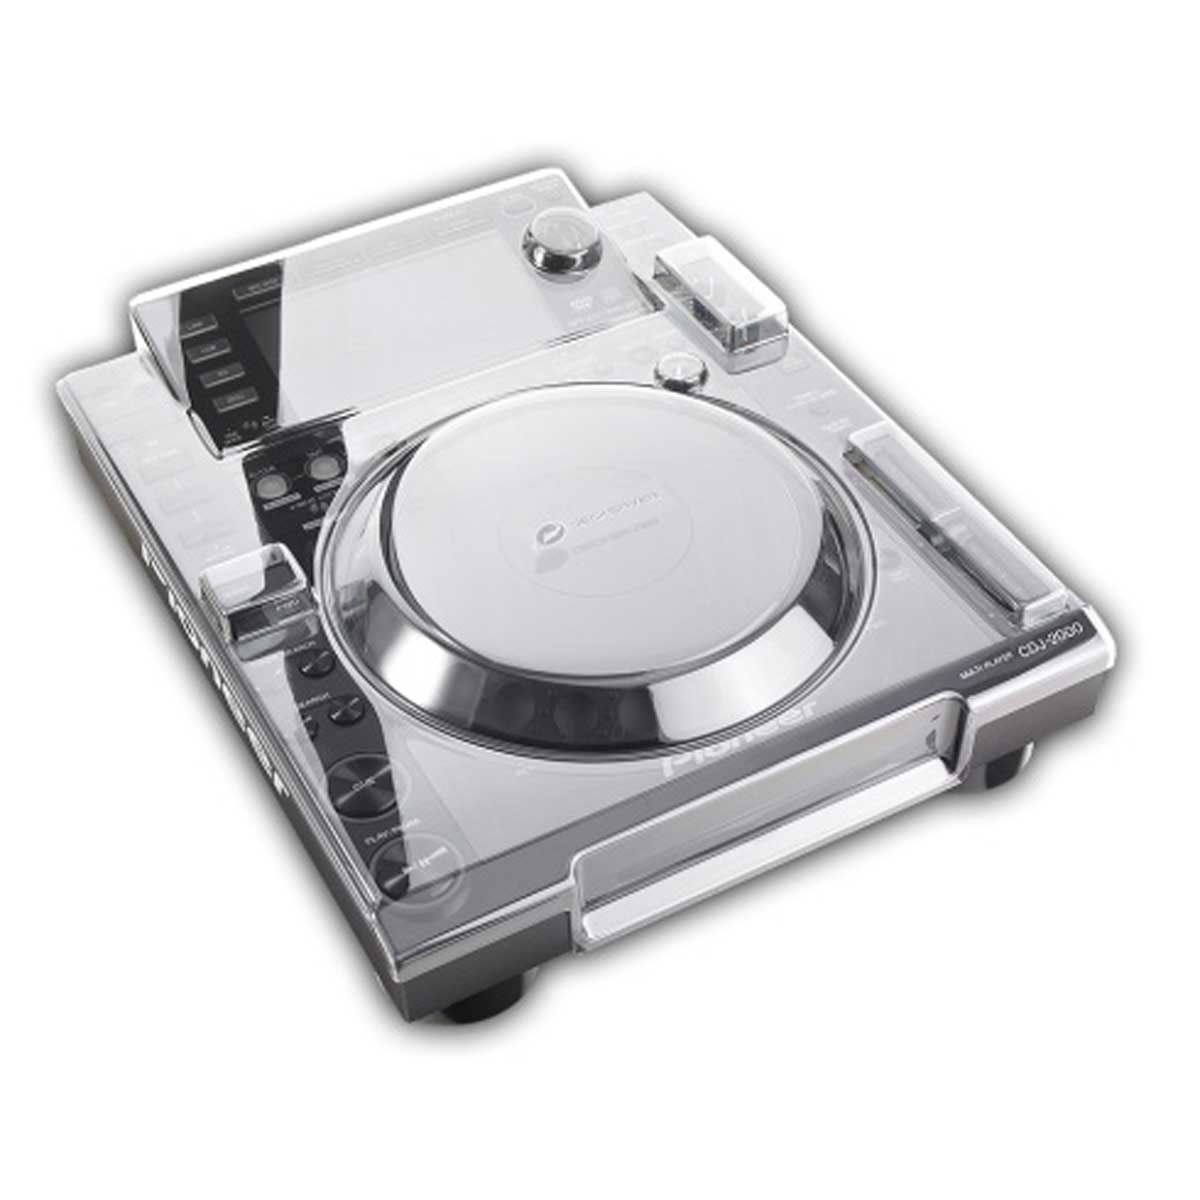 Decksaver デッキセーバー / DS-PCFP-CDJ2000NEXUS CDJ-2000nexus用保護カバー【お取り寄せ商品】